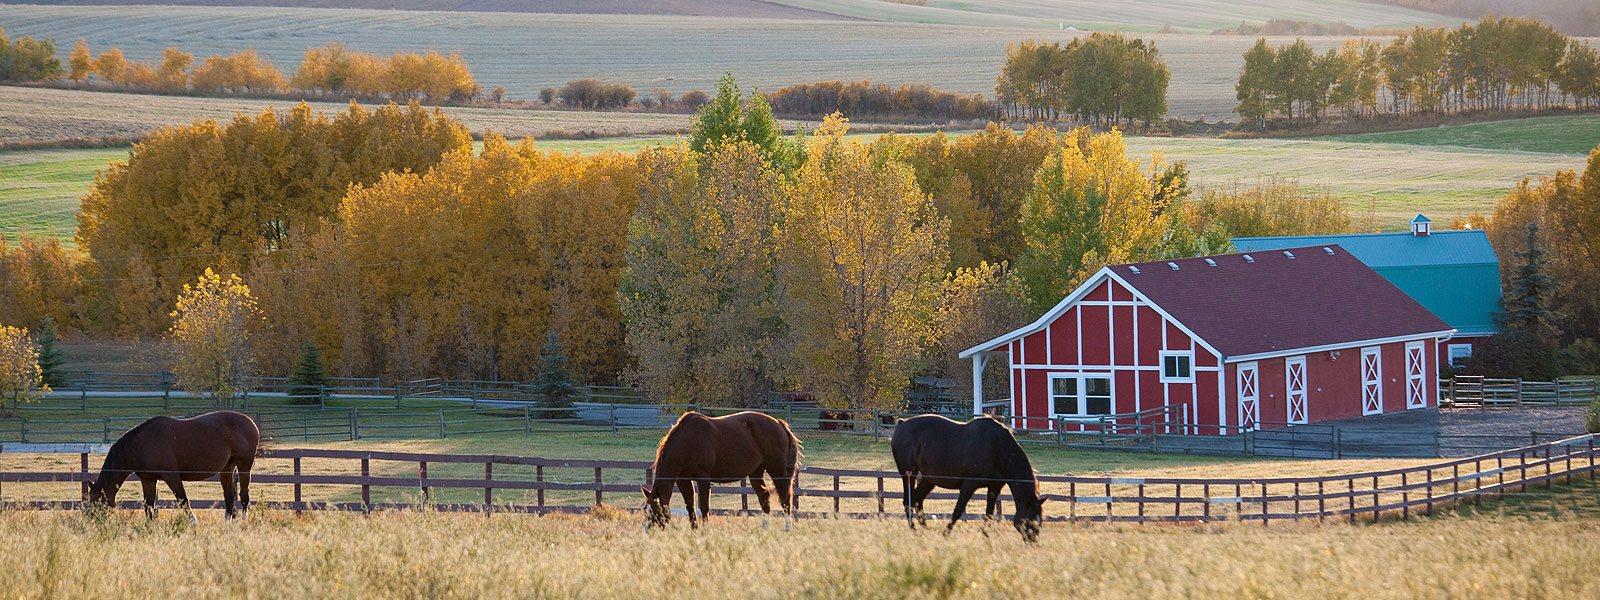 Horses and Barn